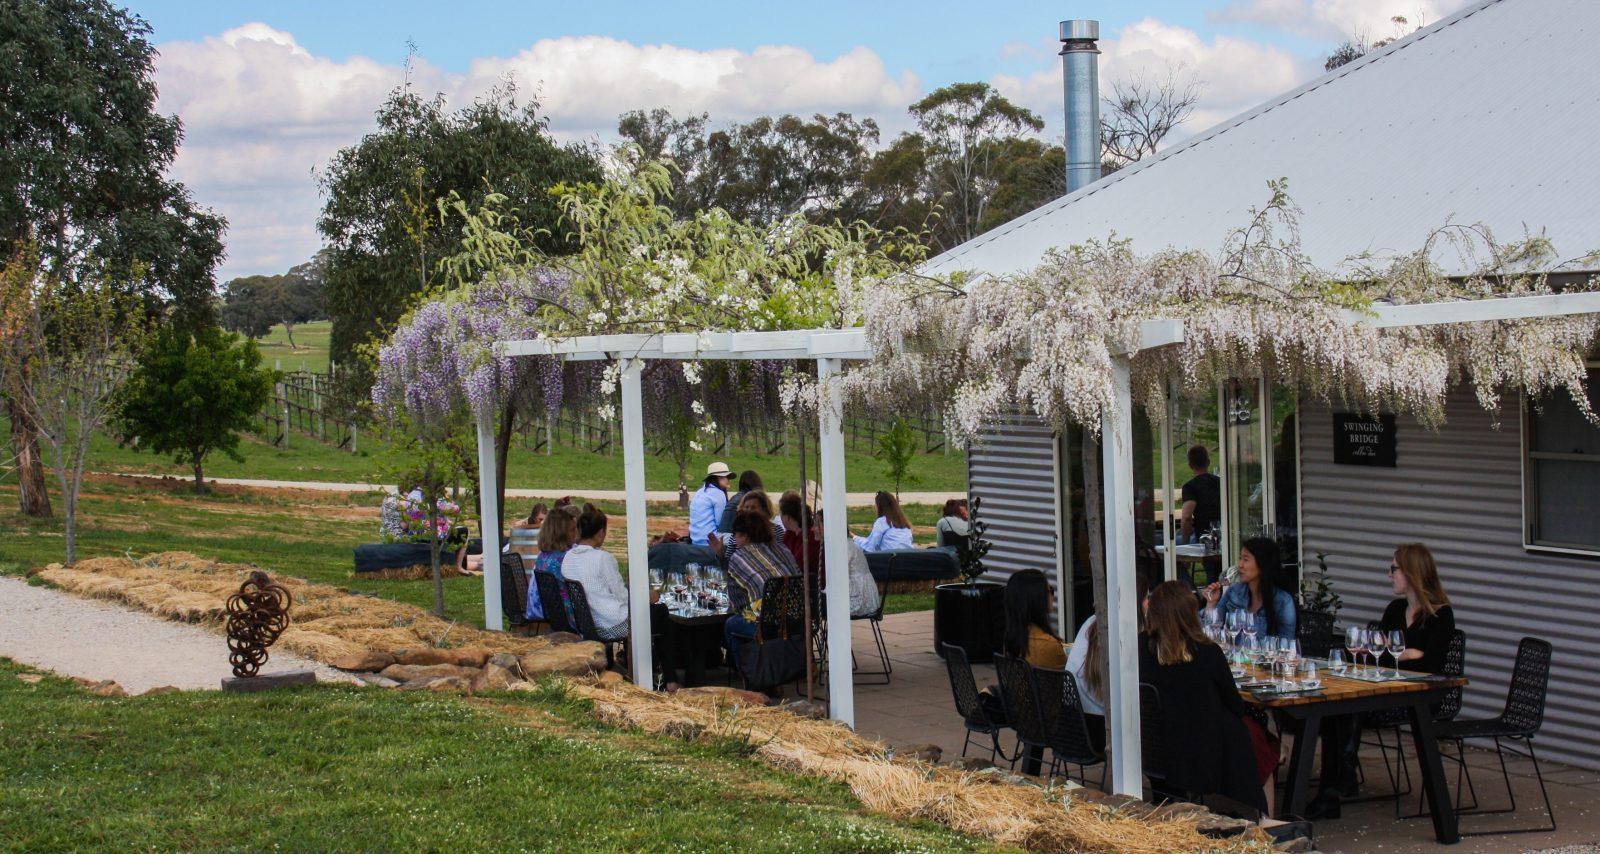 Customers enjoying the Swinging Bridge Wines